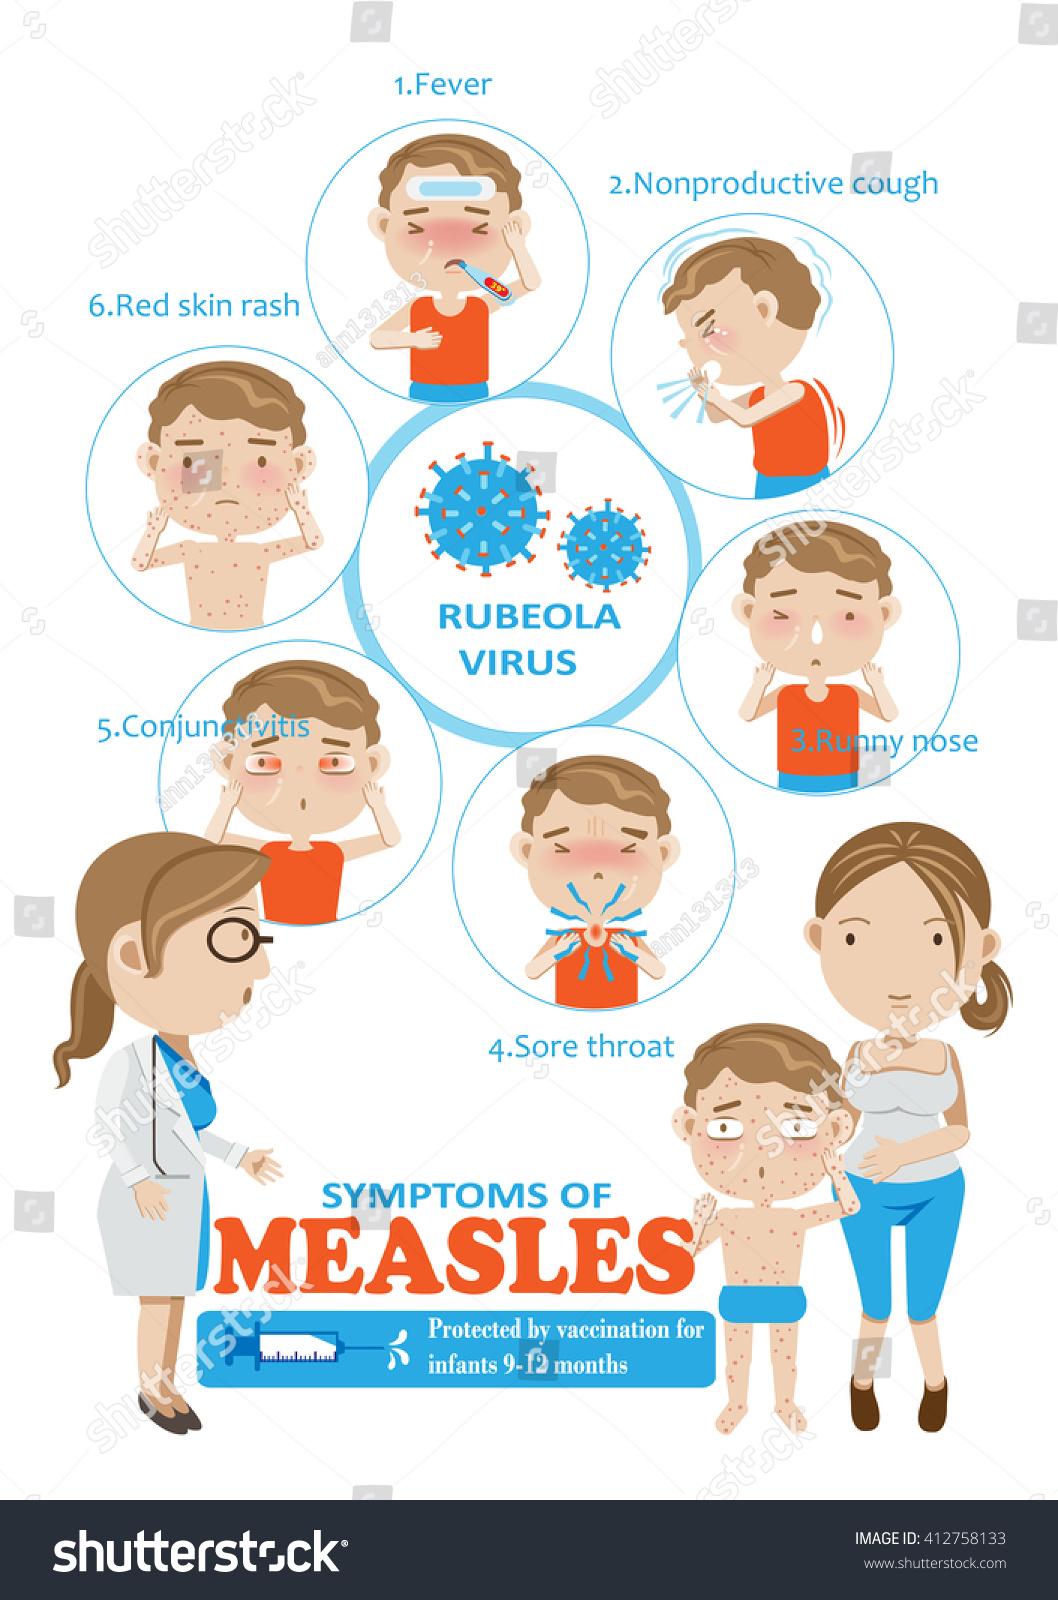 Symptoms Measles Info Graphicsvector Illustration Stock